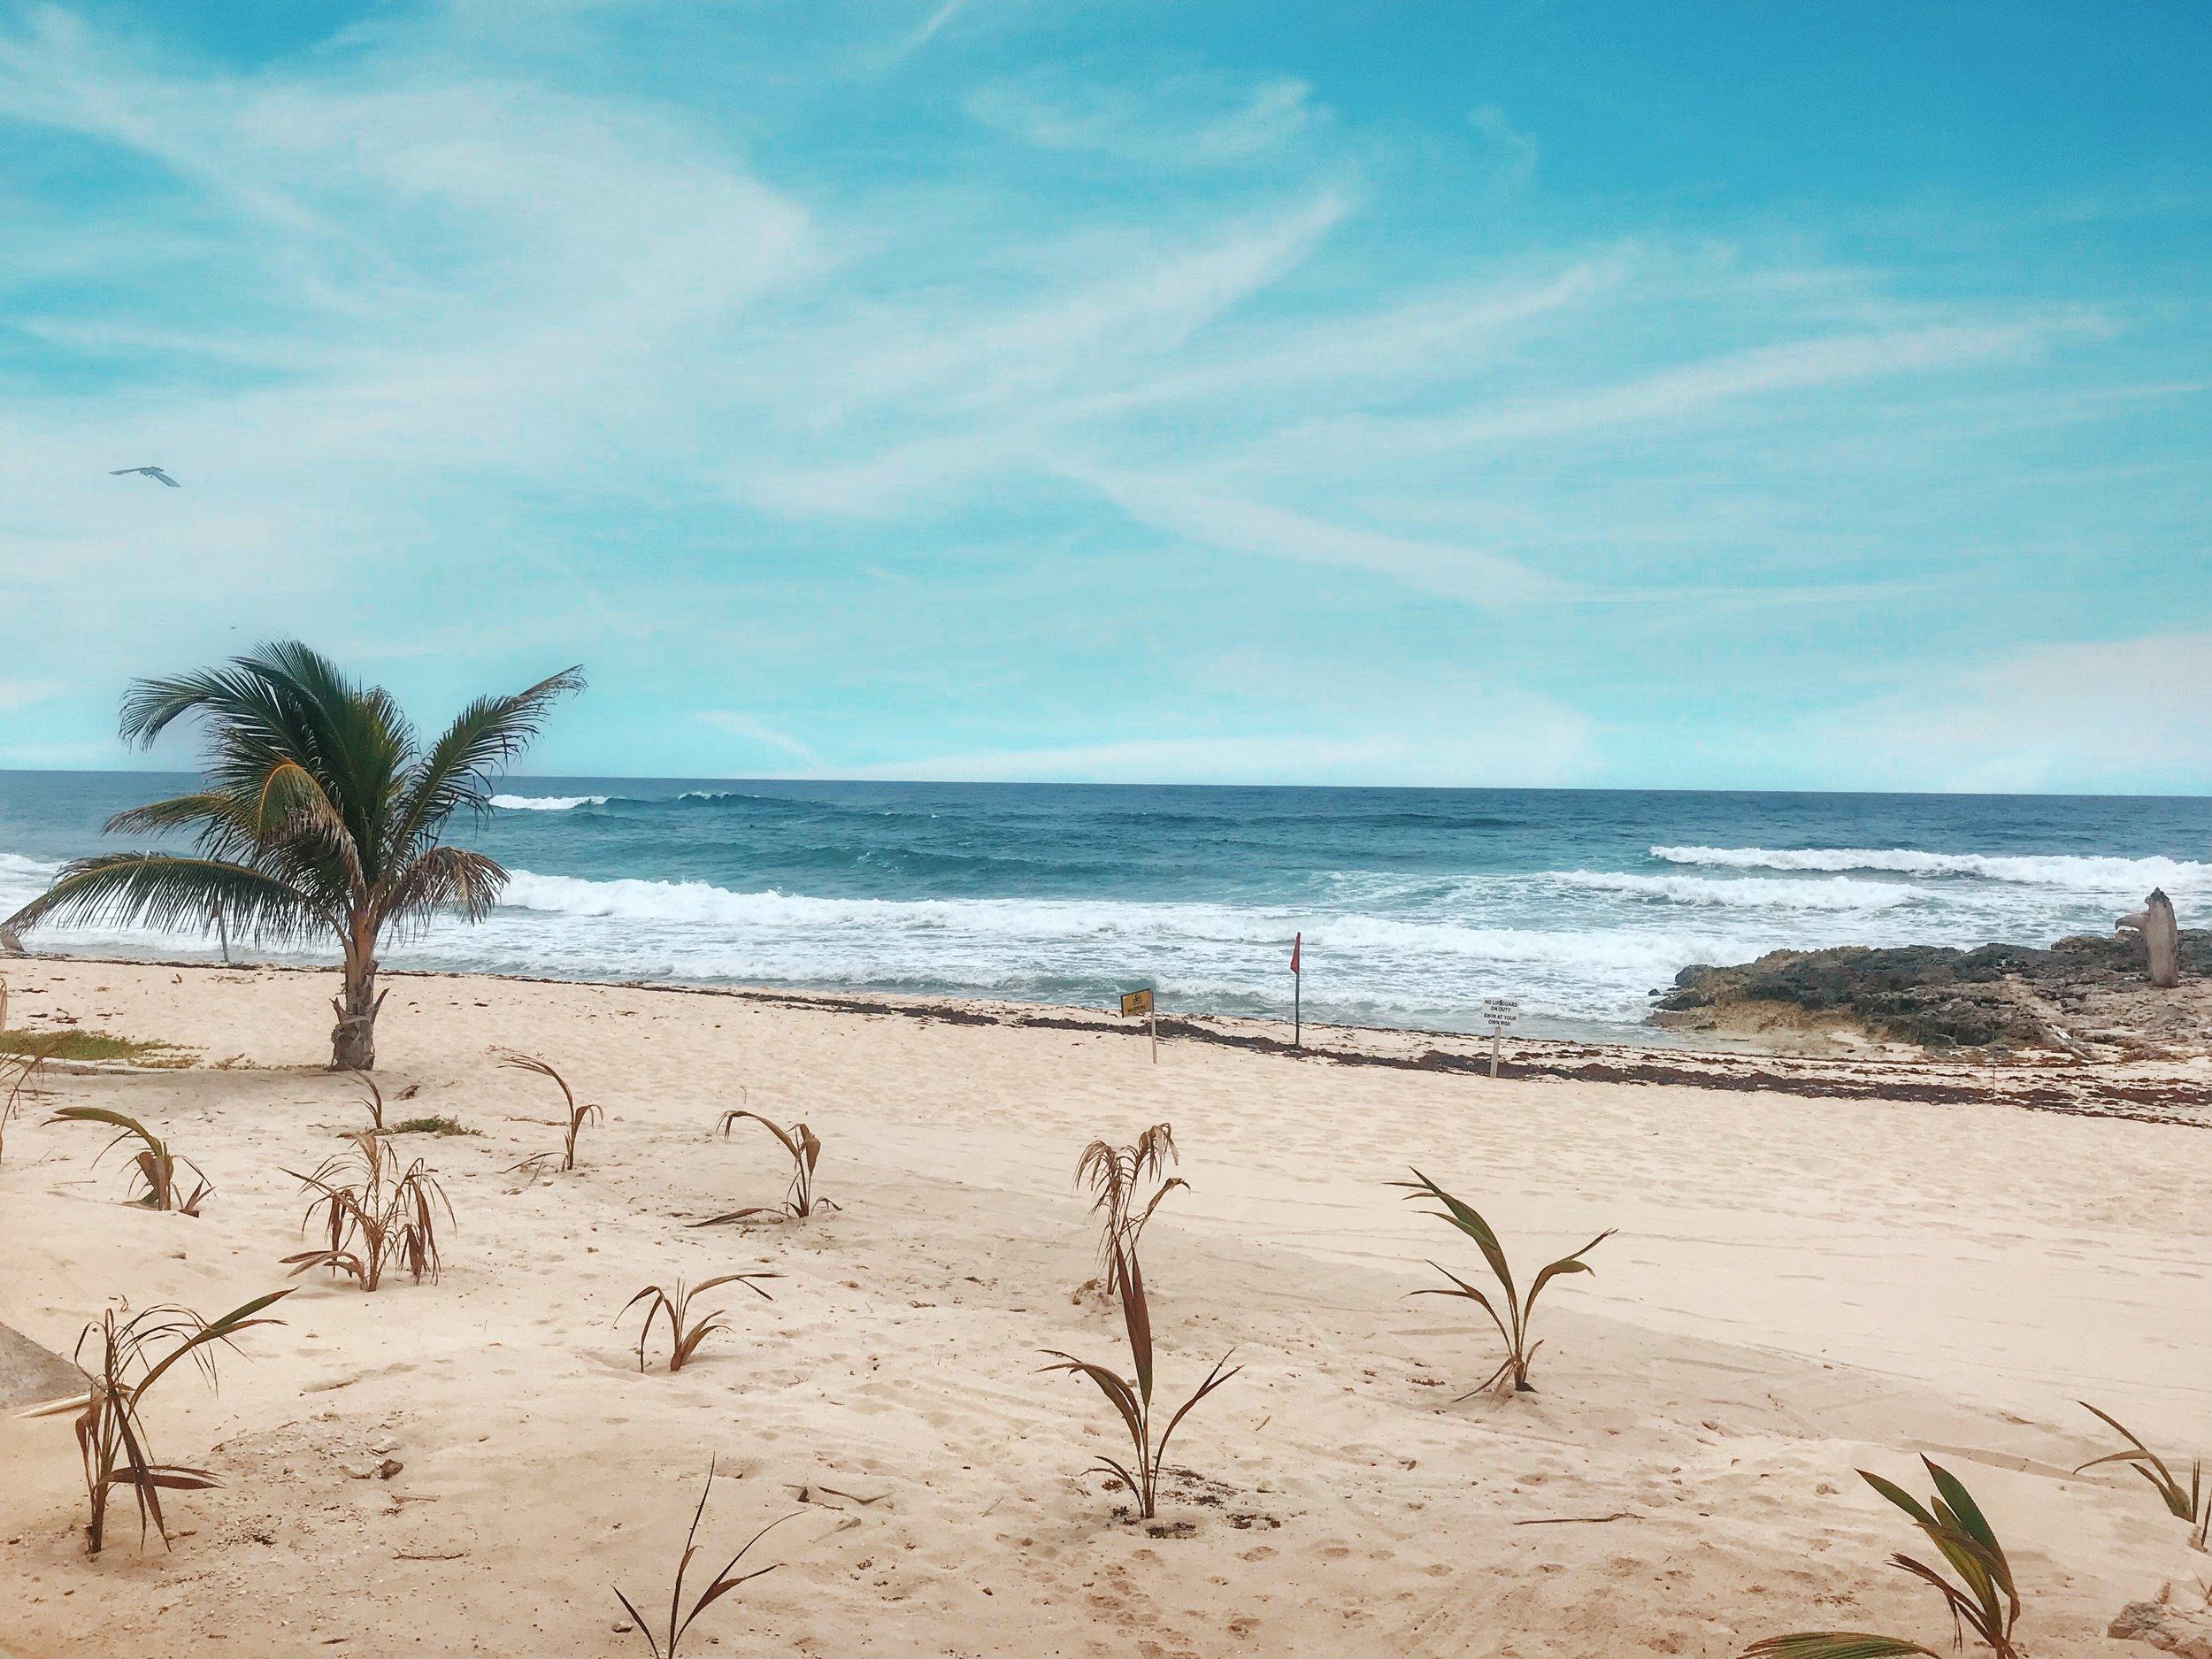 East Coast of Cozumel Mexico